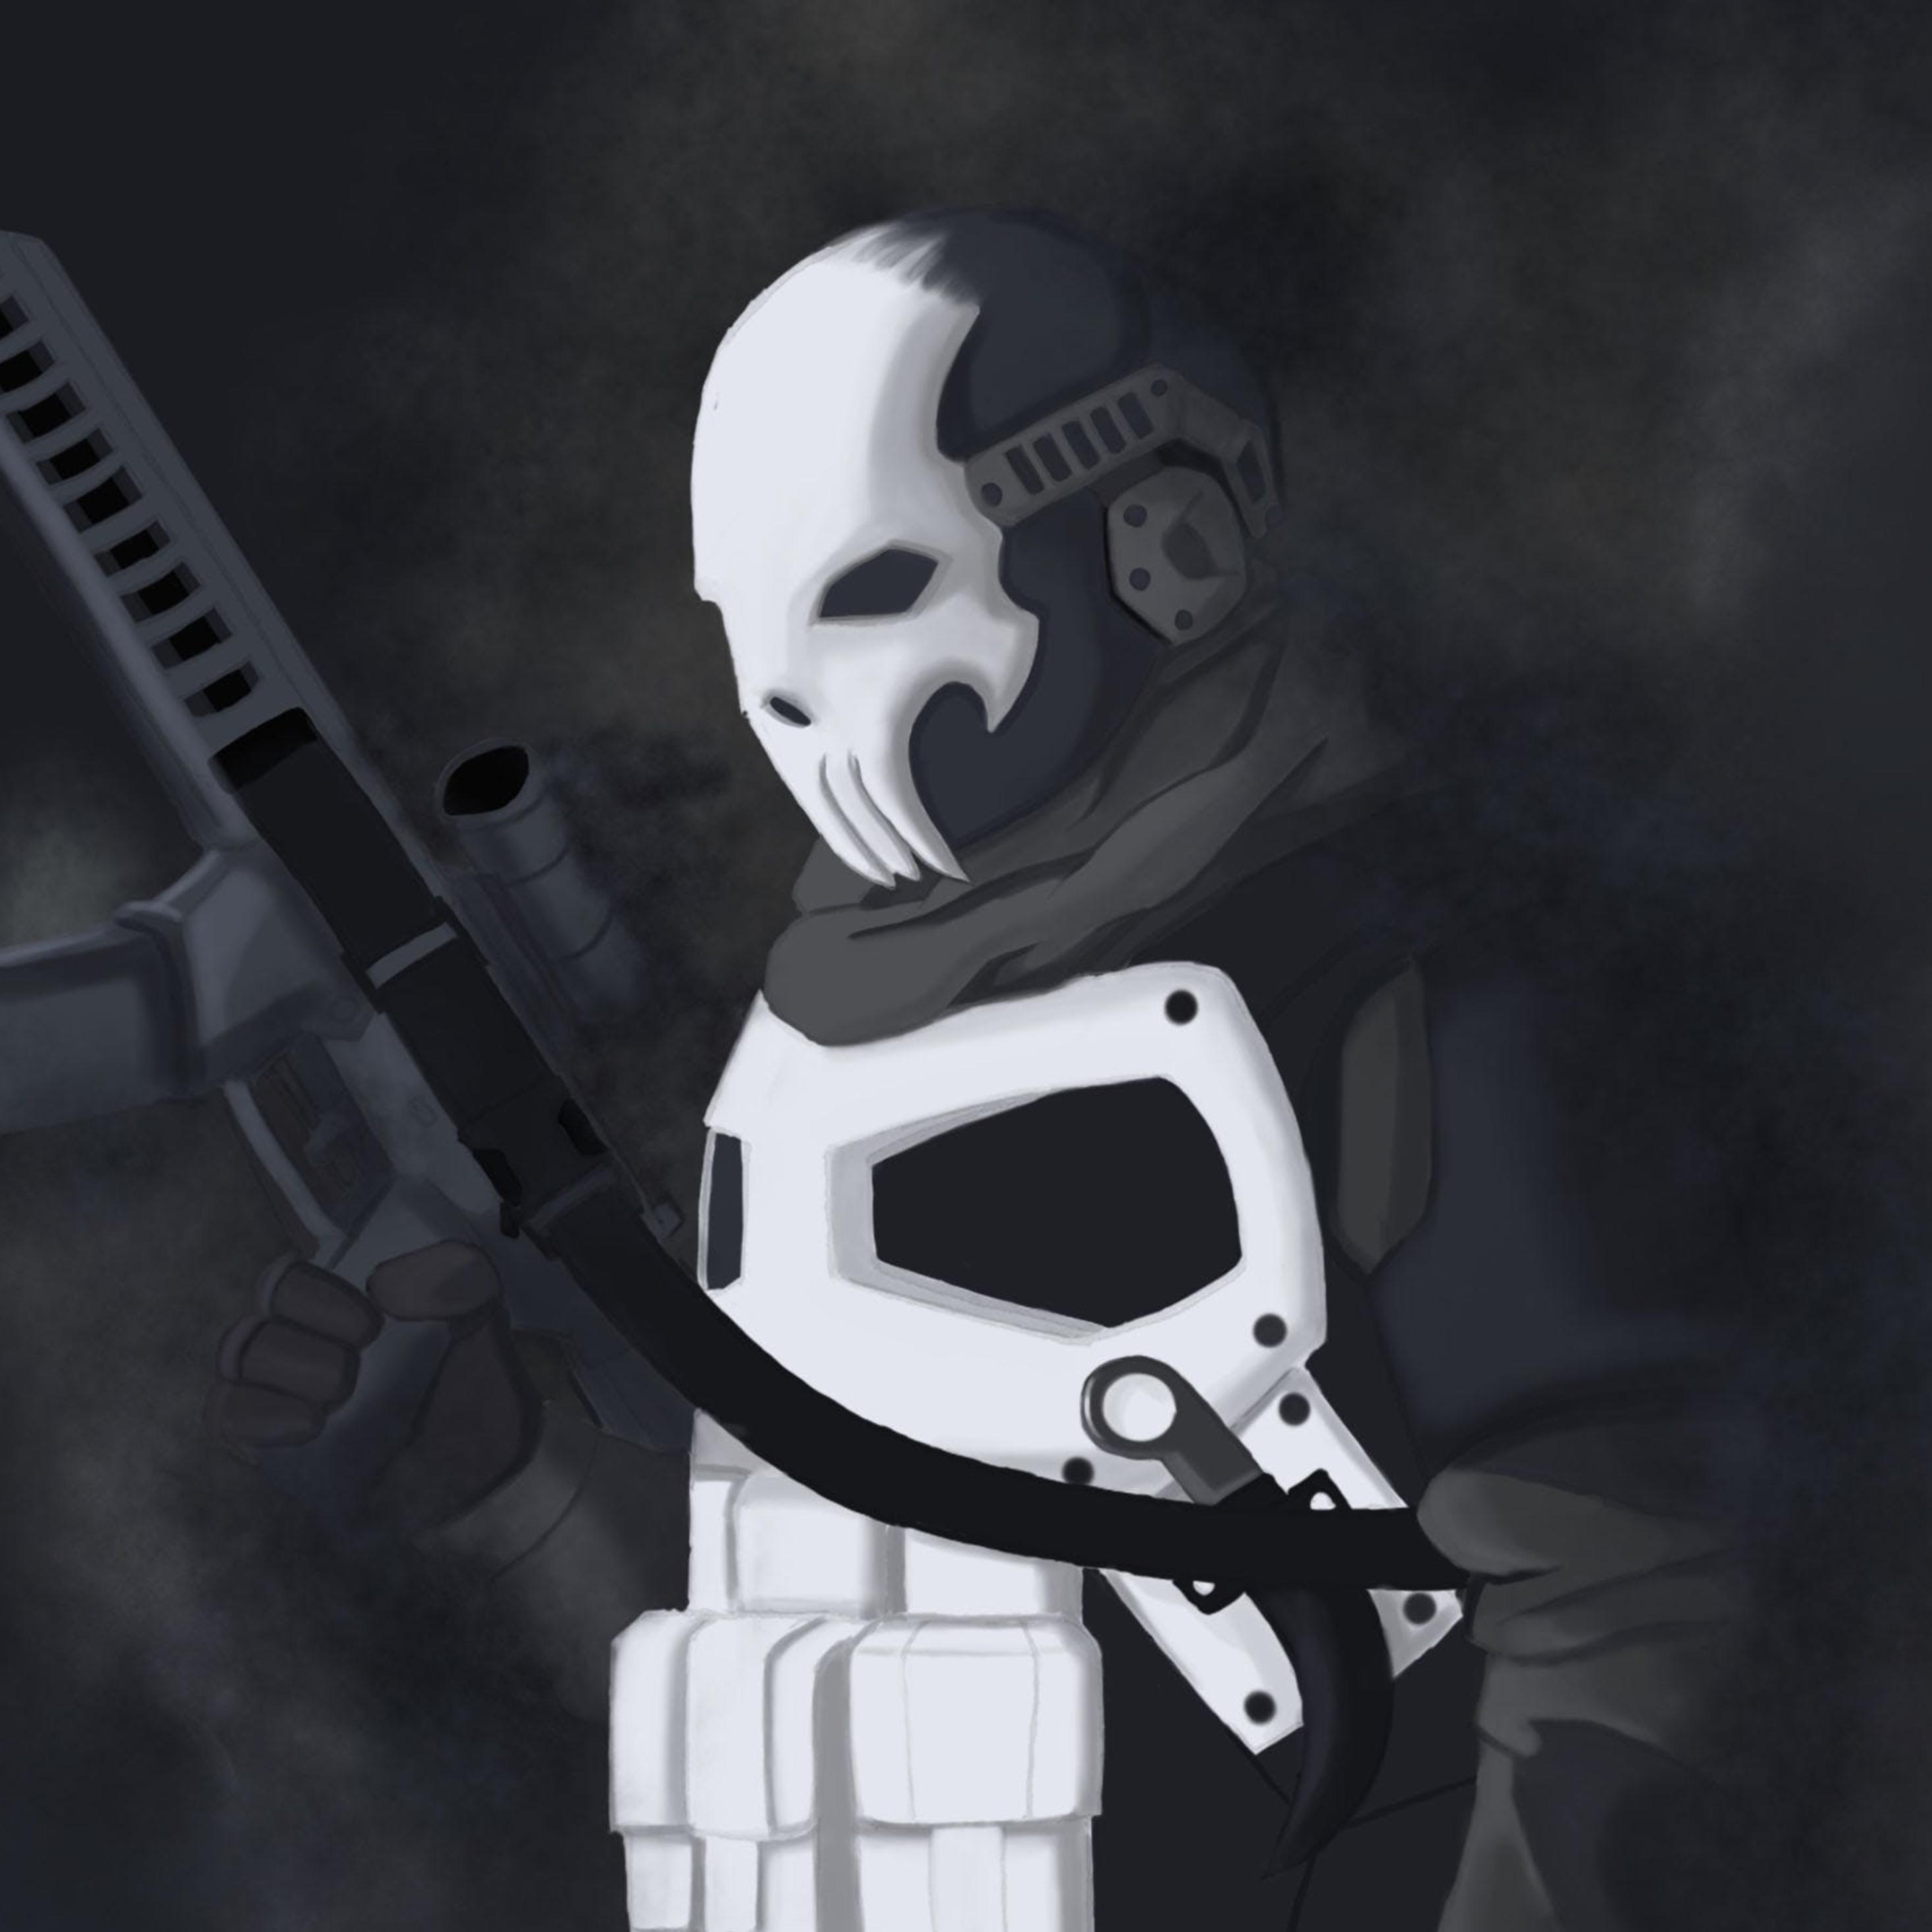 armored-punisher-artwork-bs.jpg